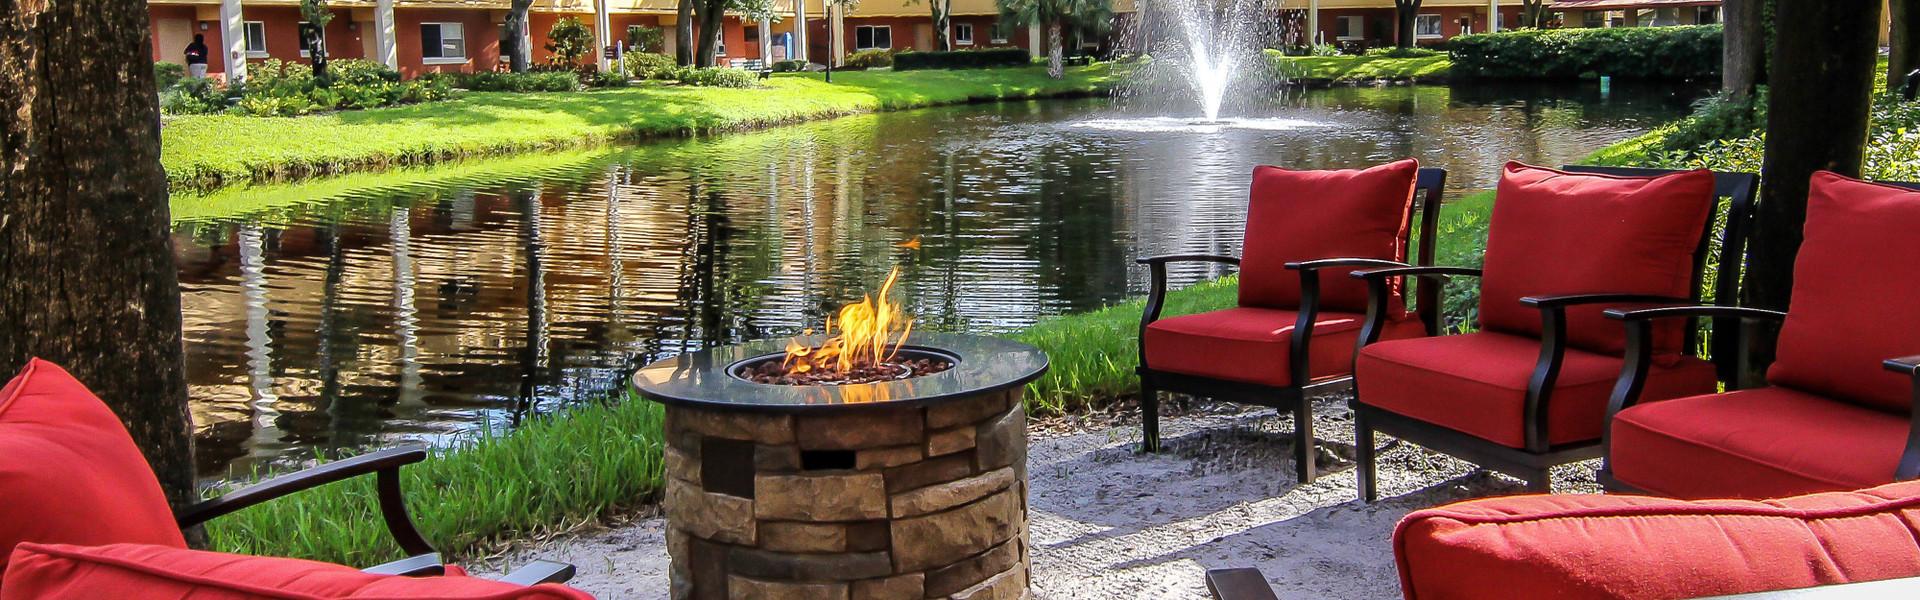 Hotel in Orlando, FL 32821 | Lakeside Fire Pit